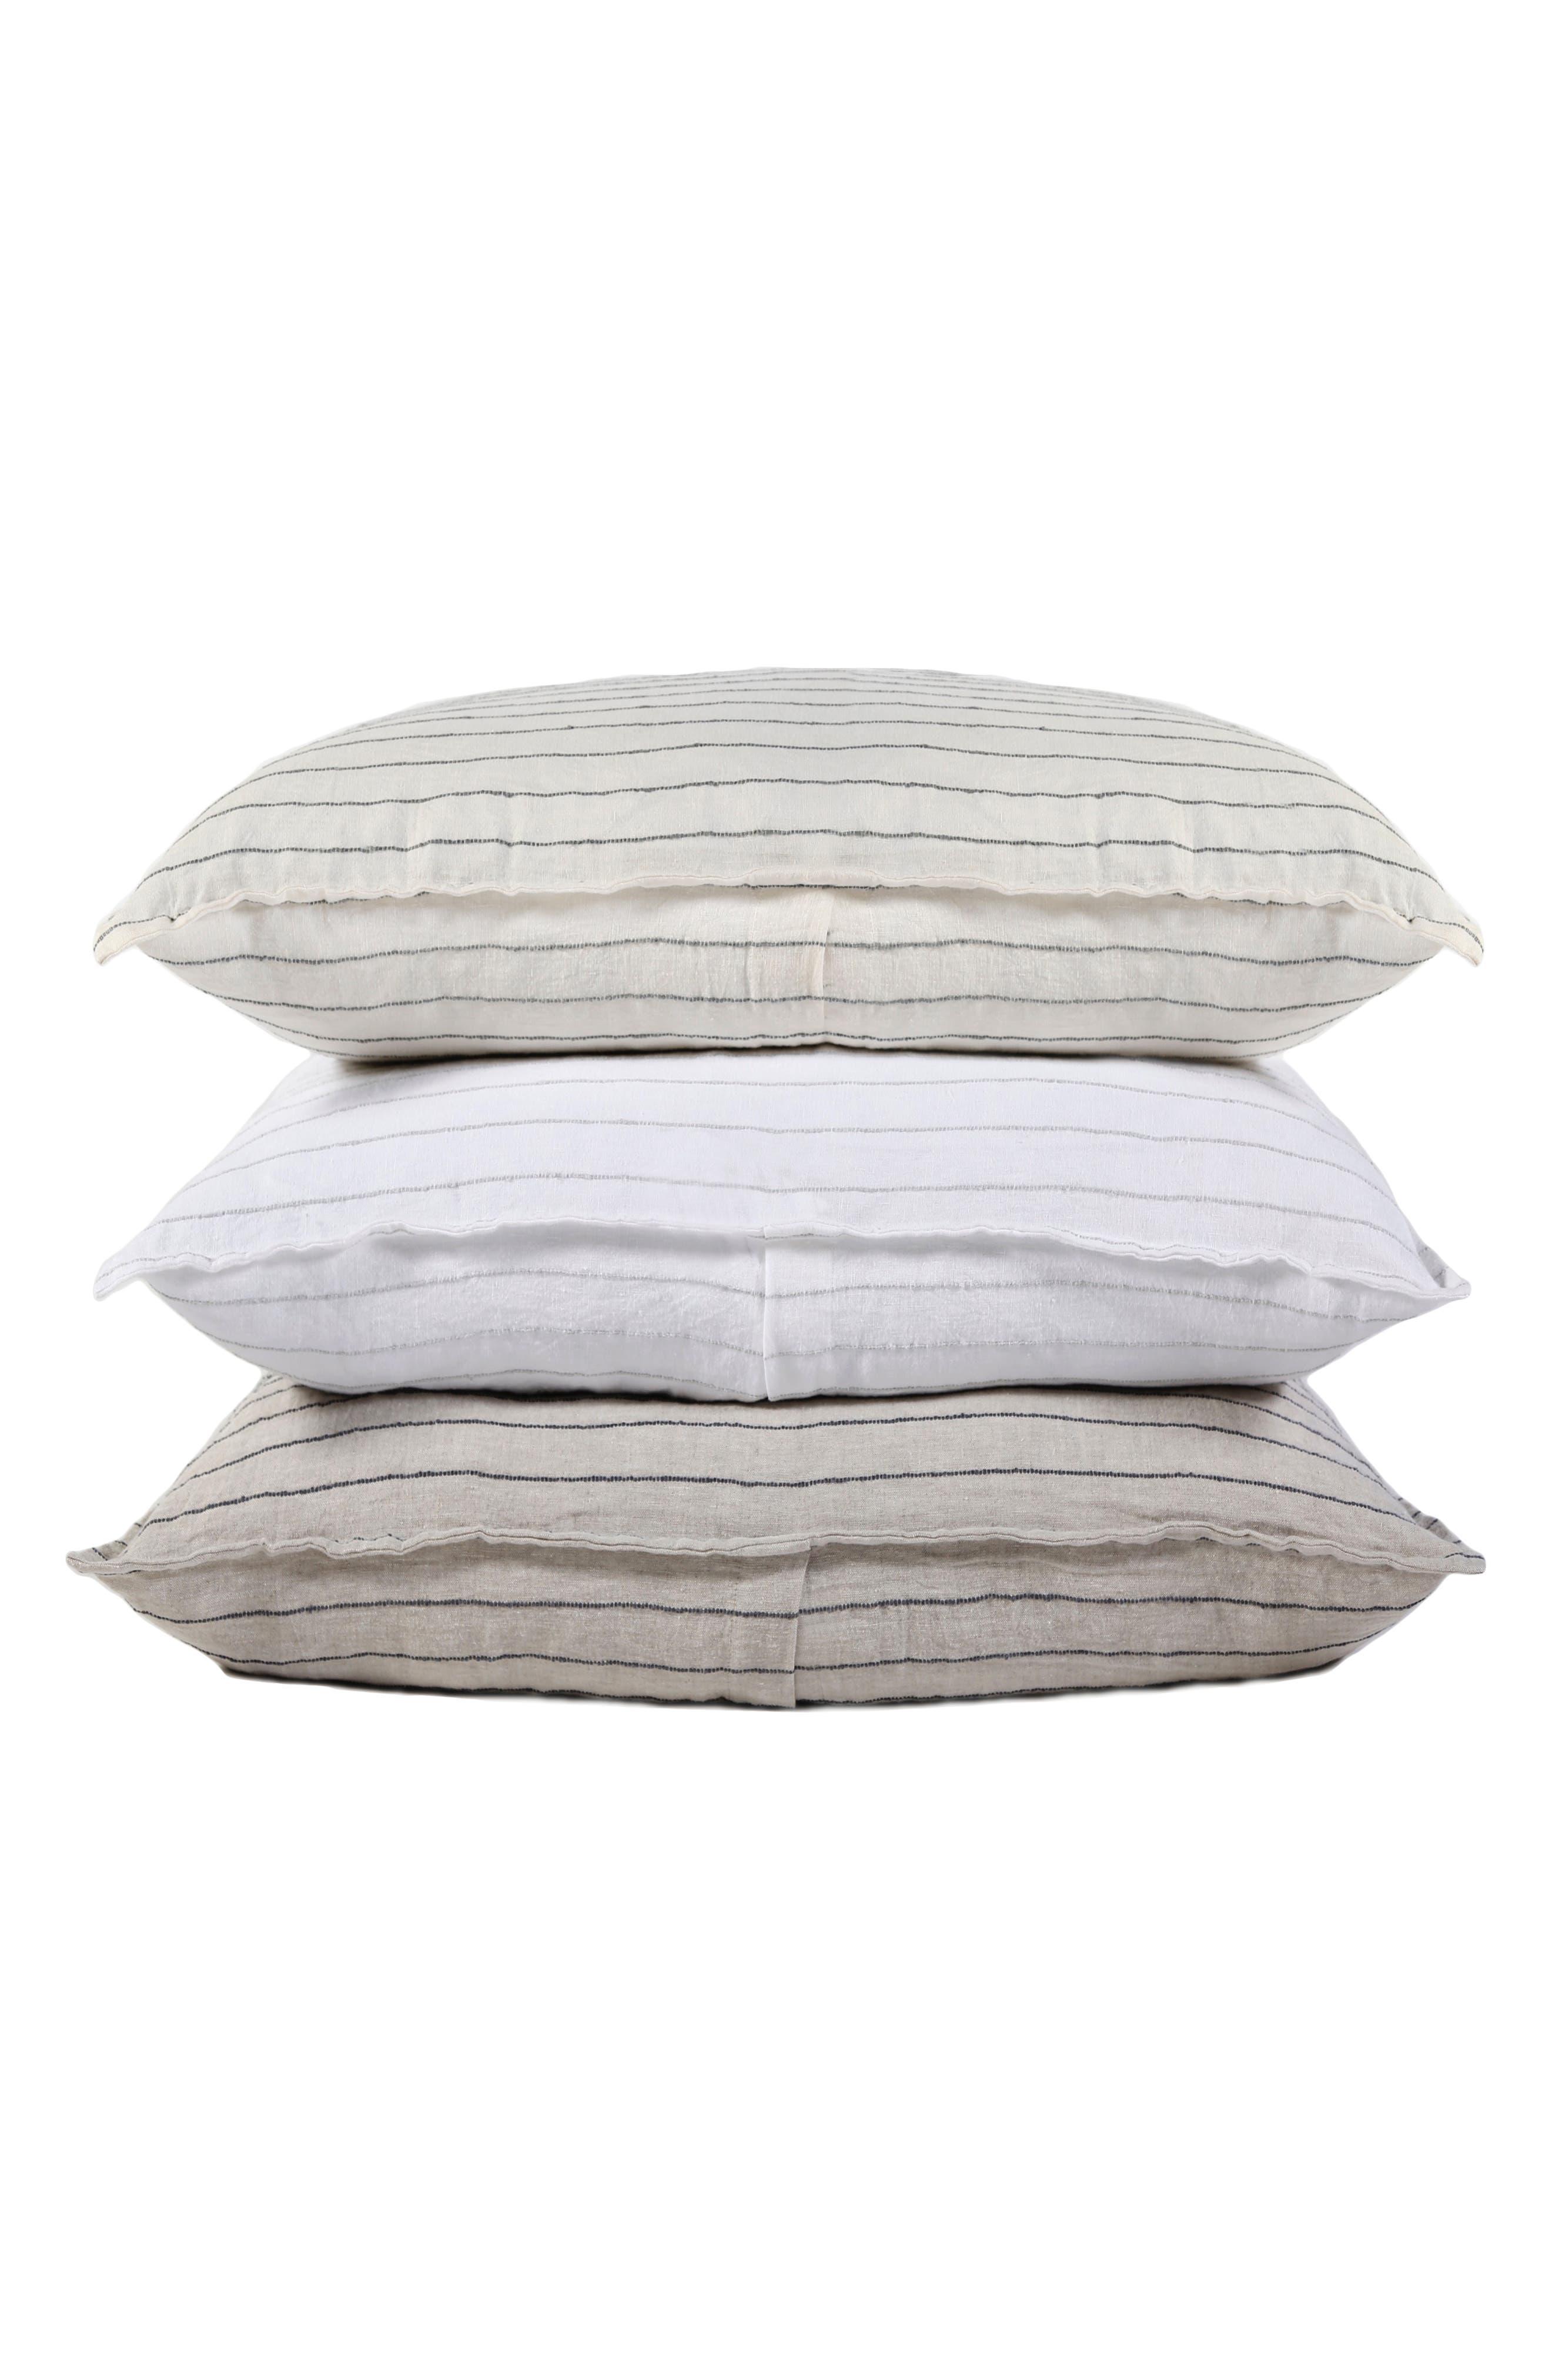 Blake Big Linen Accent Pillow,                             Alternate thumbnail 3, color,                             WHITE/ OCEAN